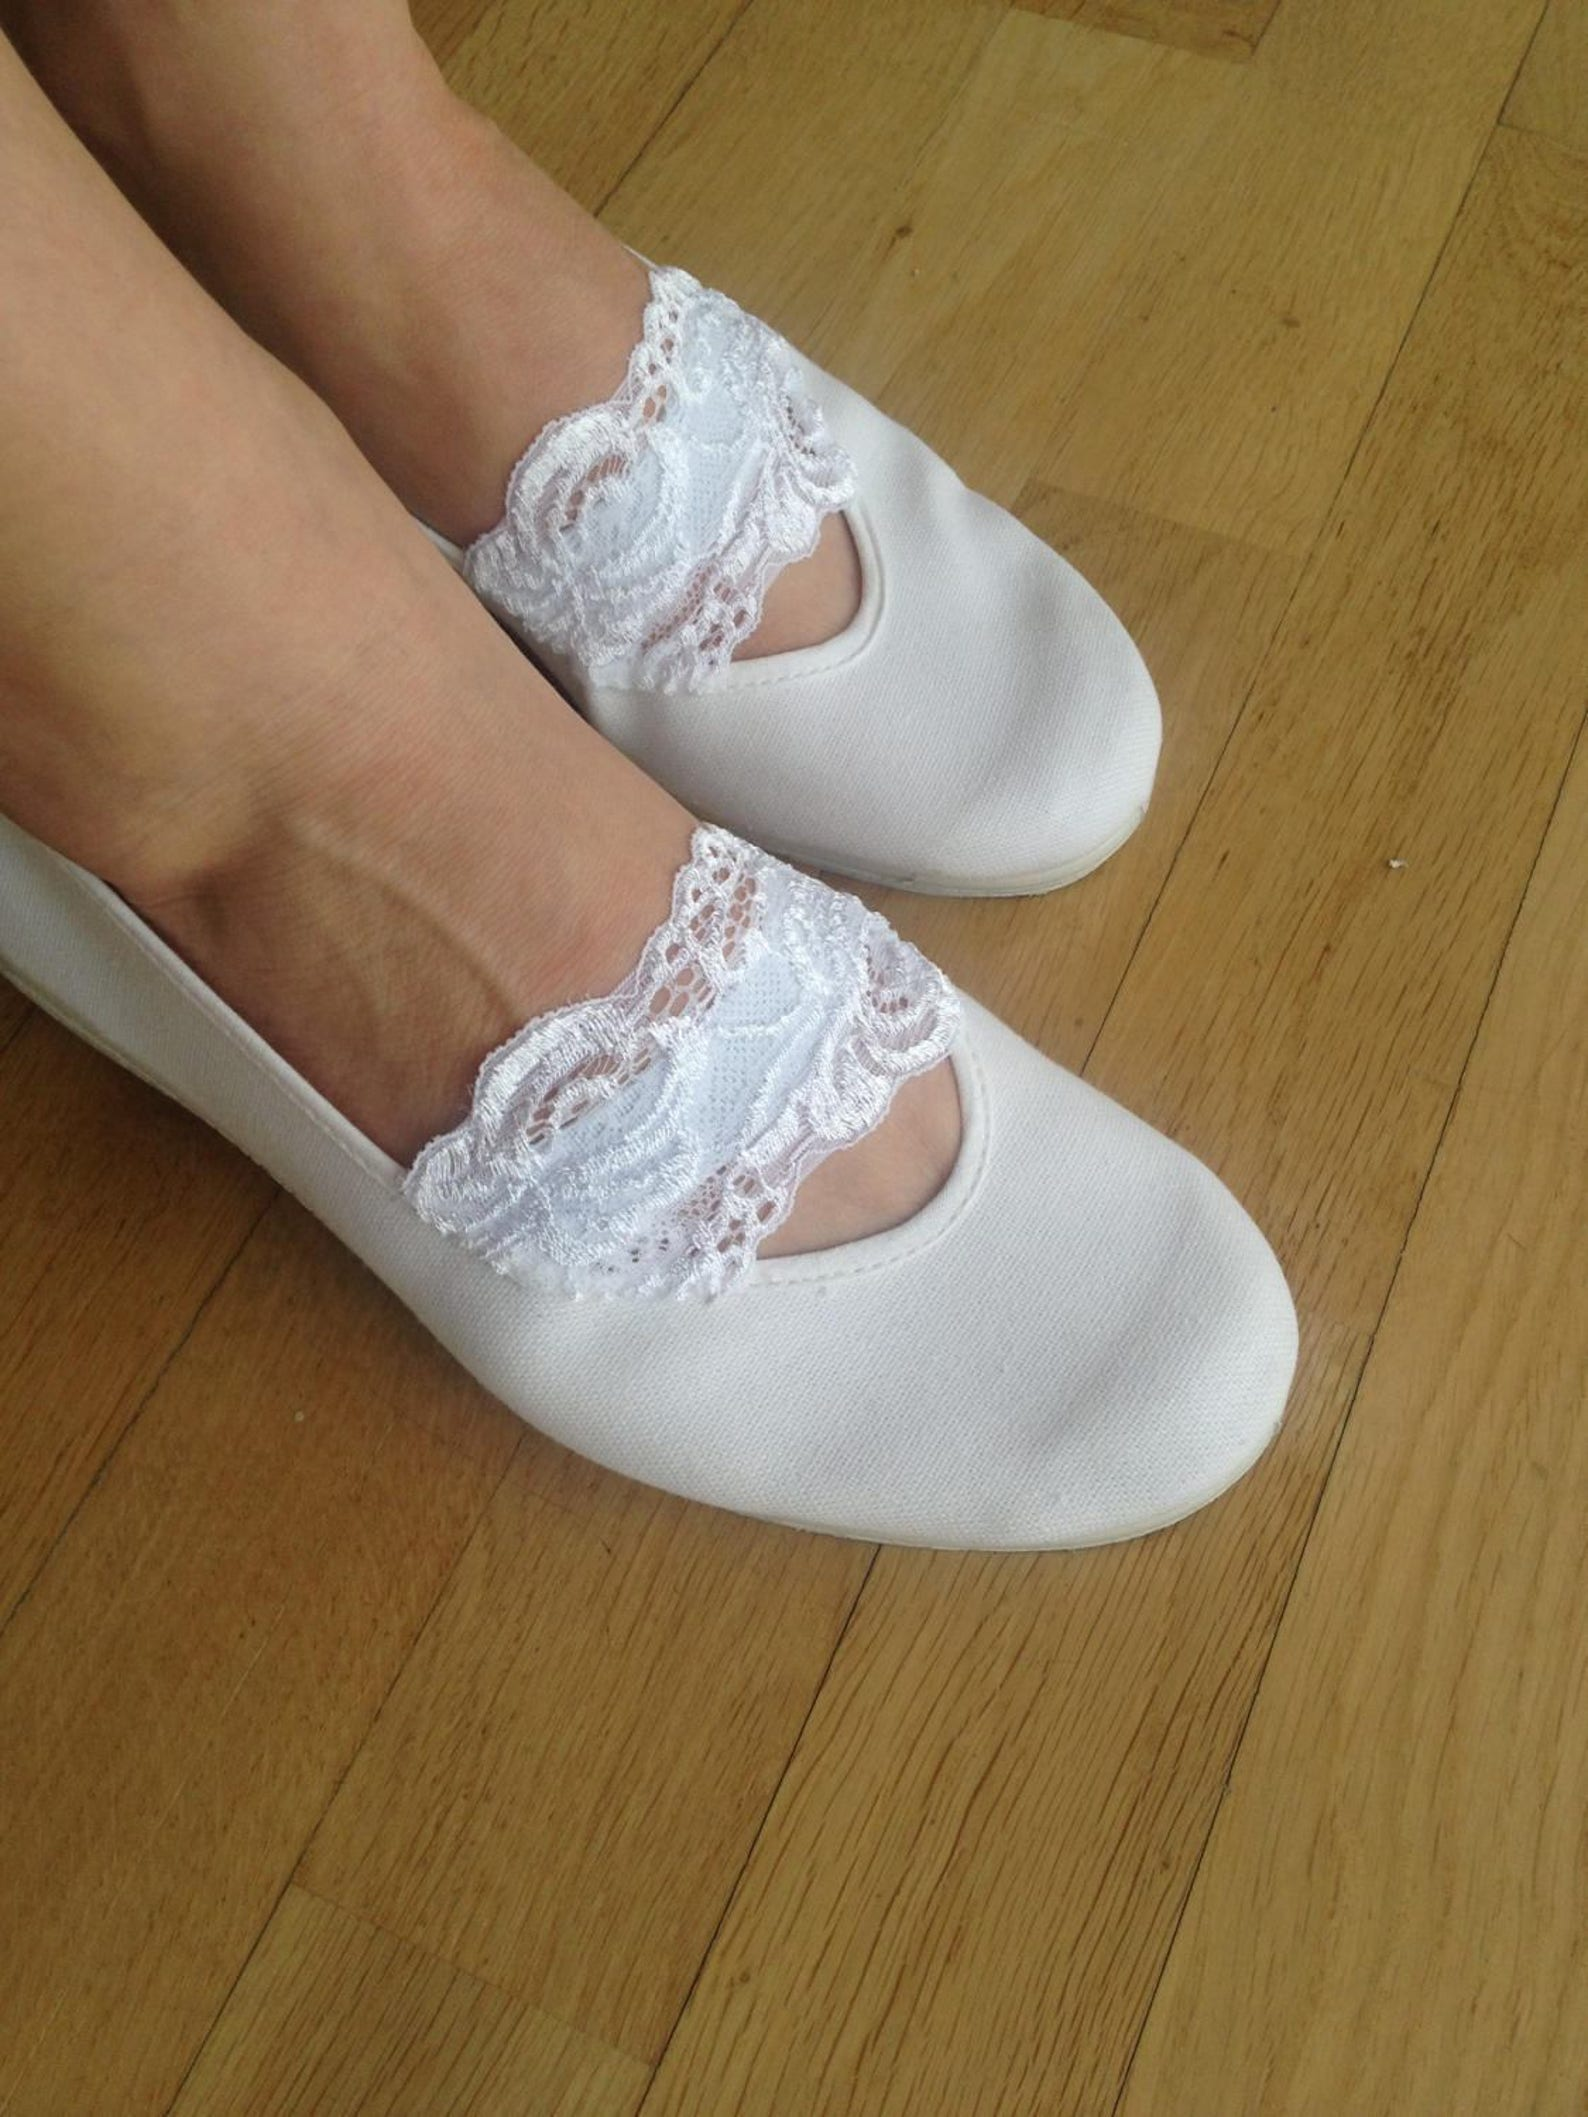 wedding shoes,woman's wedding shoes,girls shoes,mary jane shoes,bridal flats,wedding ballet flats,bridal shoes,summer dress